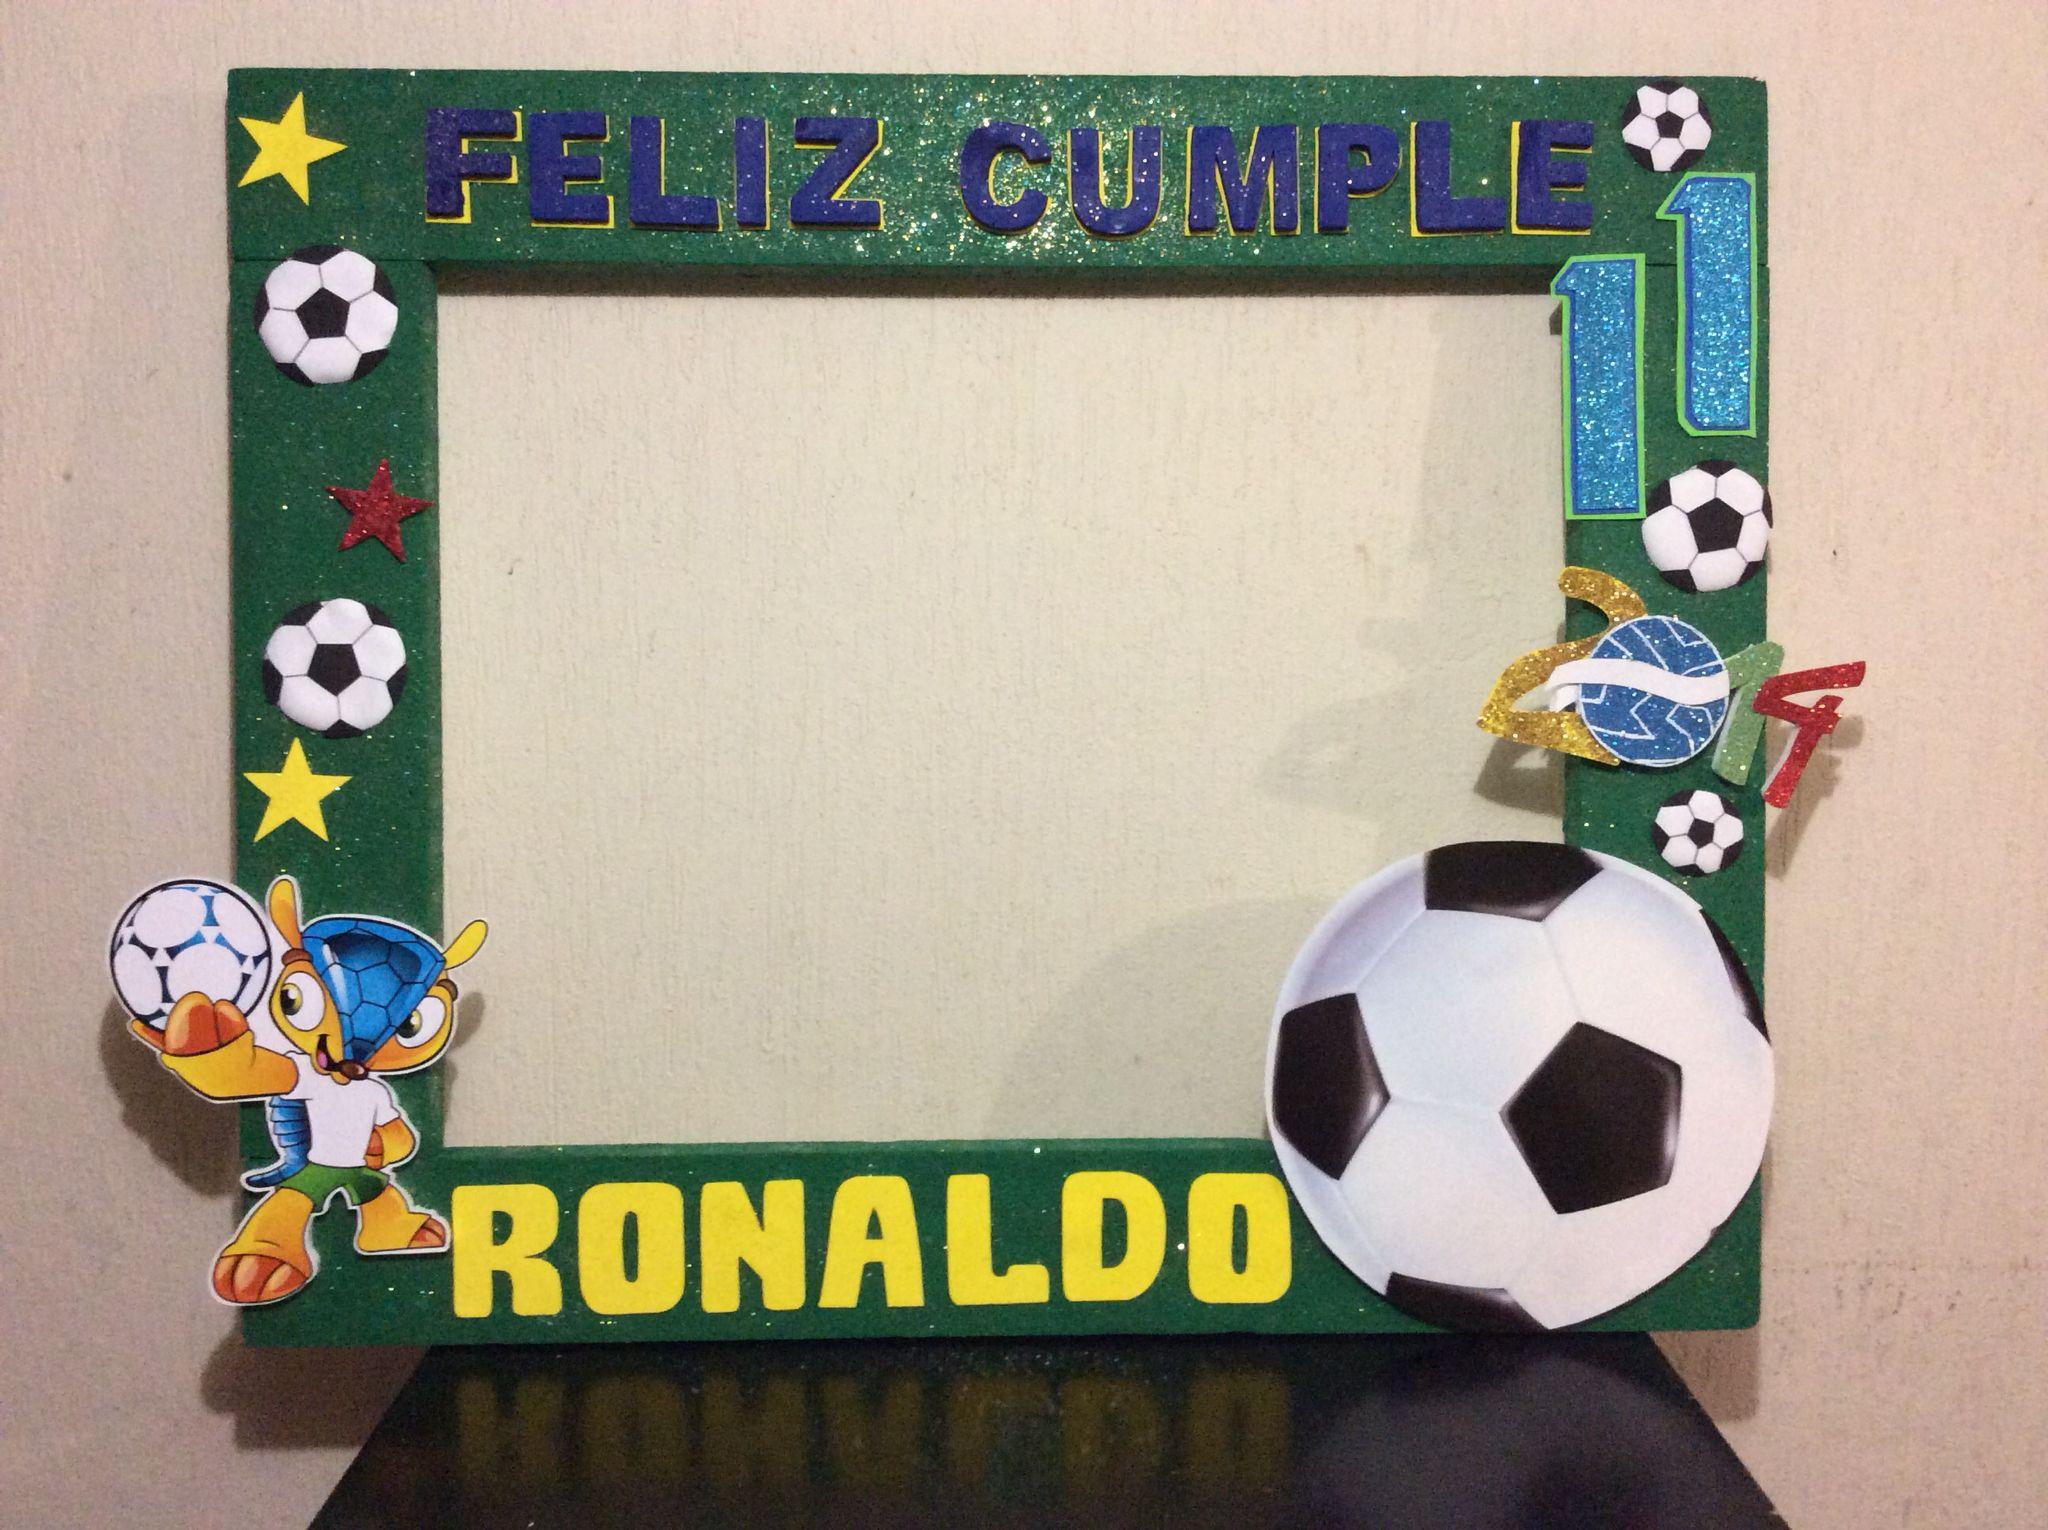 Marco futbolero | Diferentes decoraciones | Pinterest | Soccer party ...